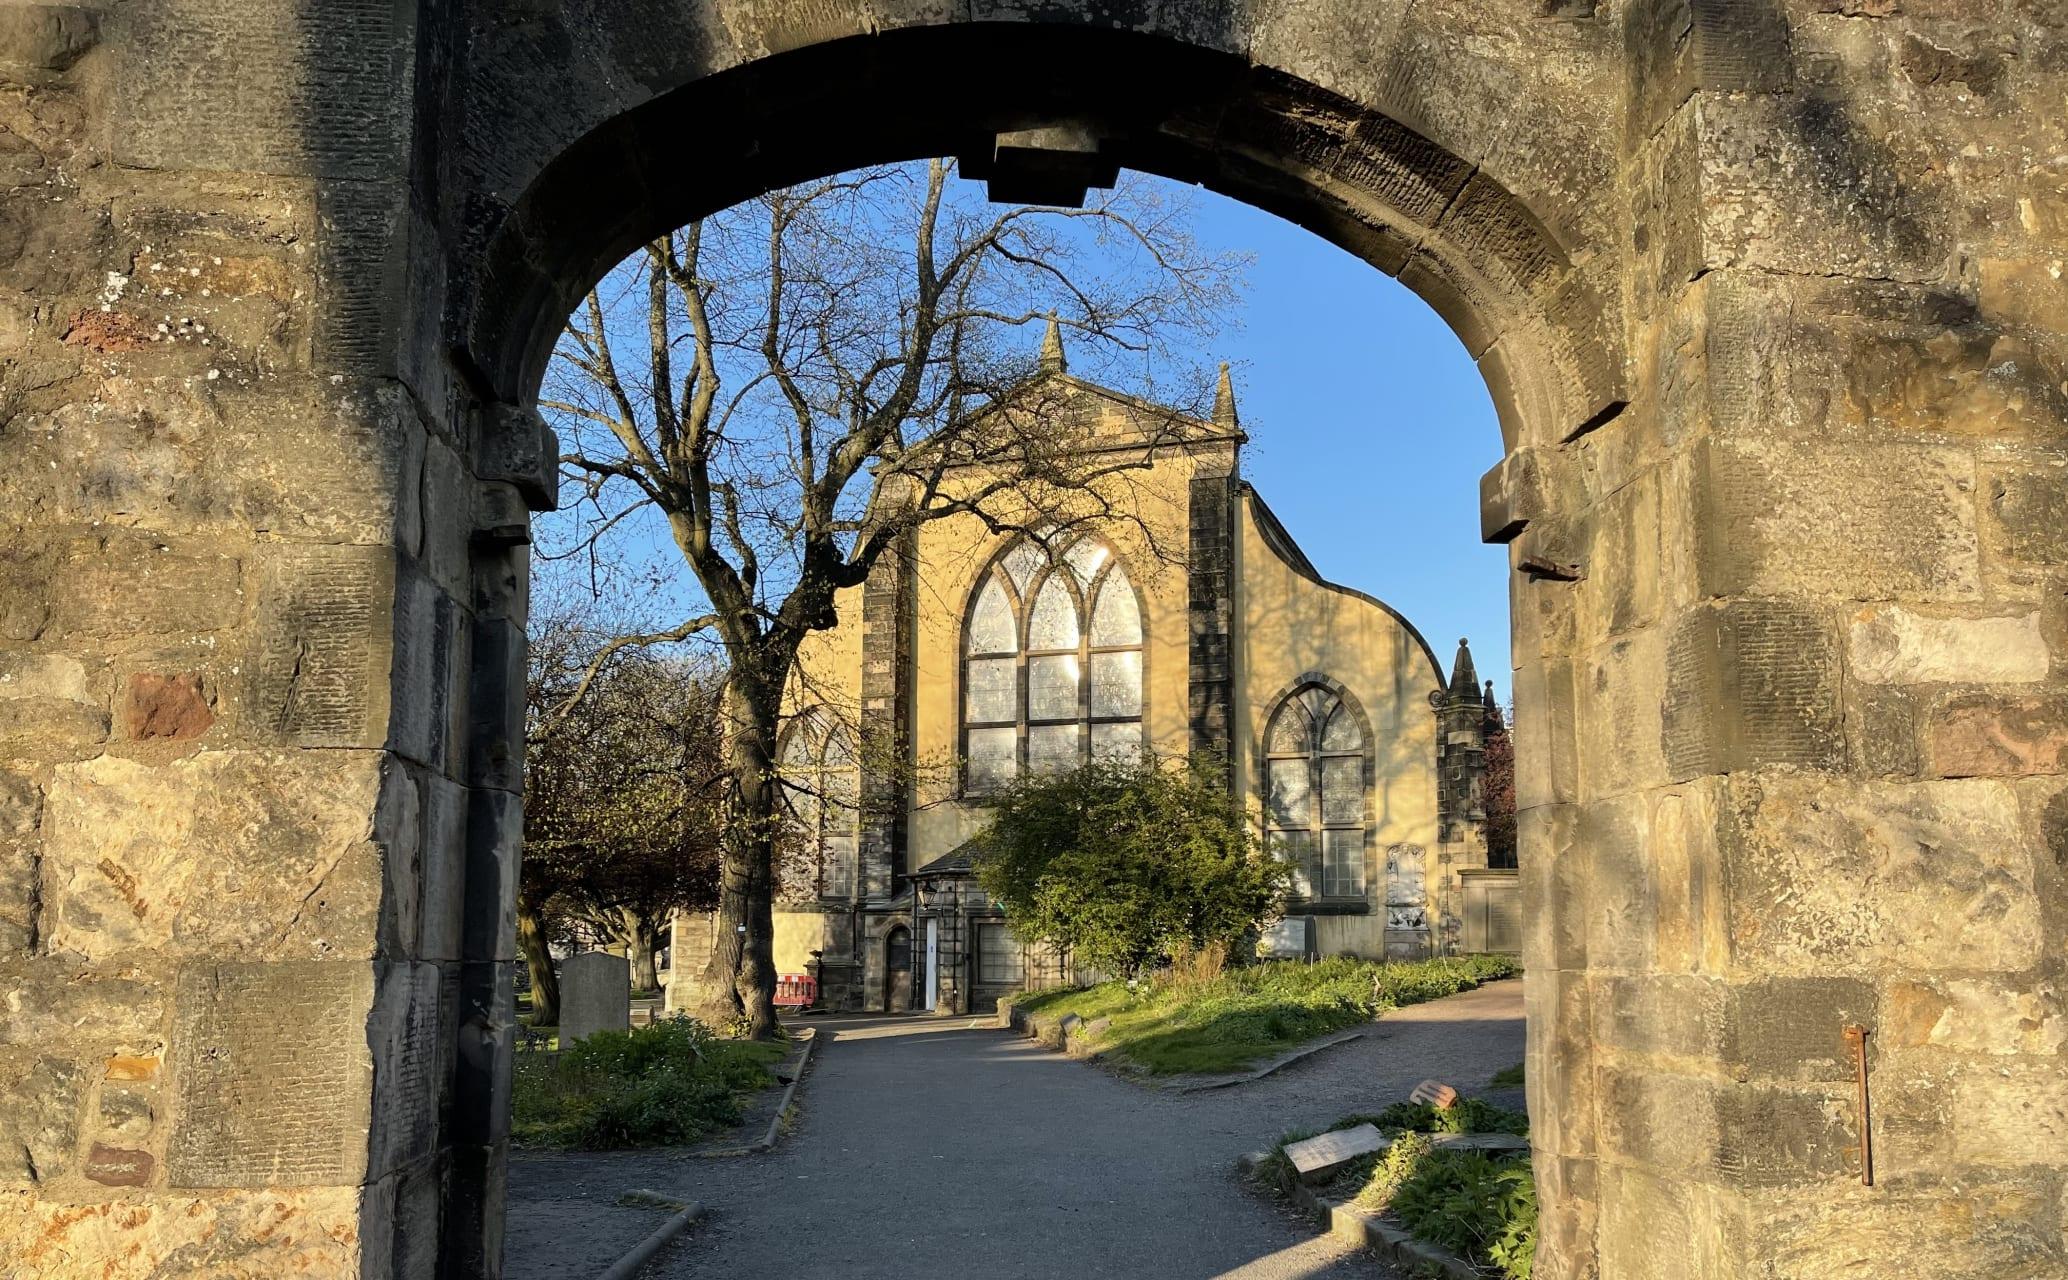 Edinburgh - Greyfriar's Kirk and Kirkyard: UNESCO World Heritage Site